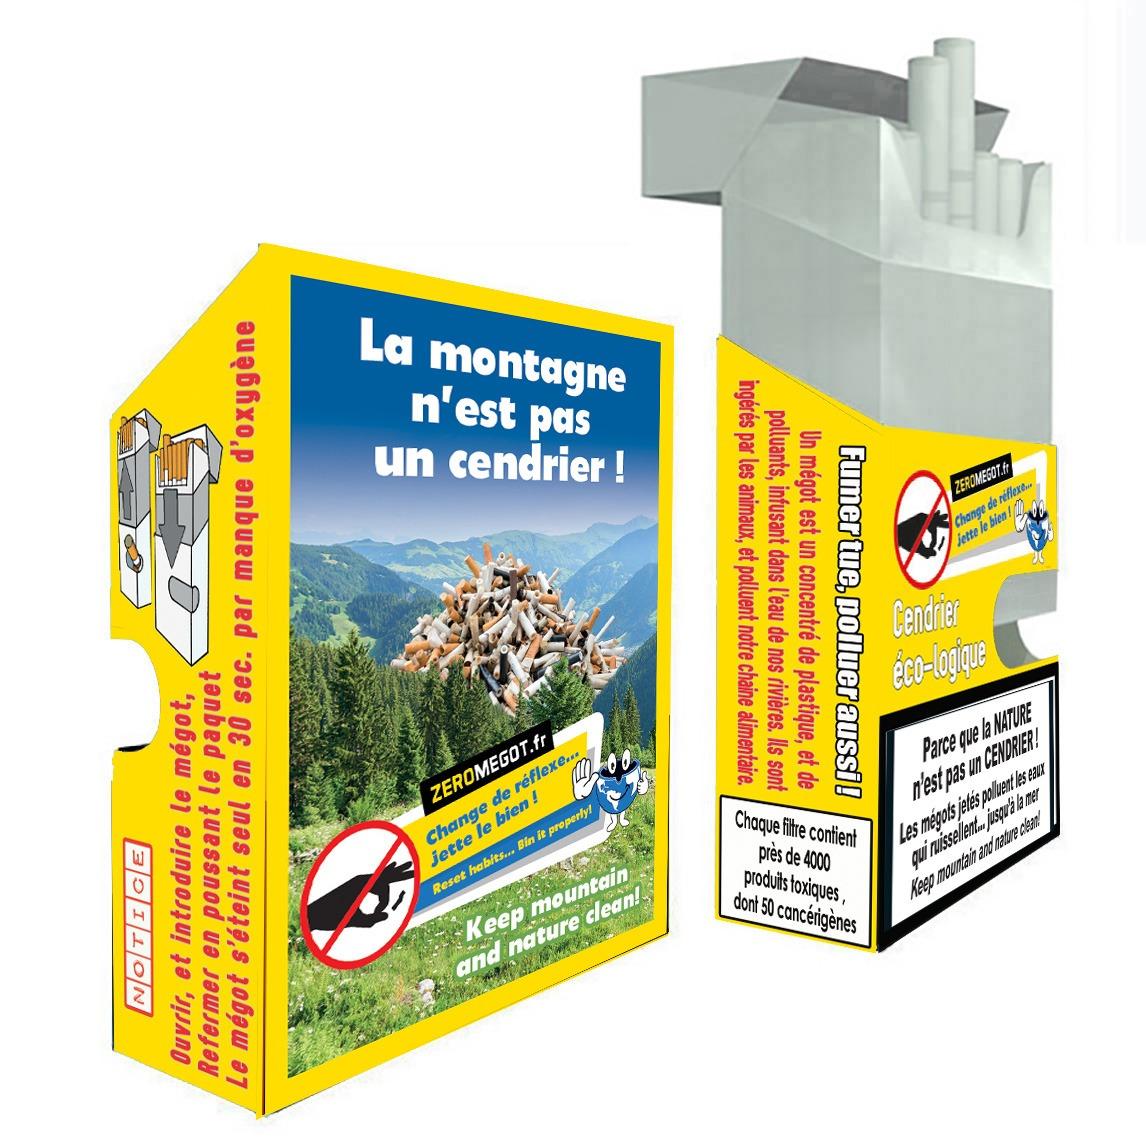 Pocket zero megot montagne